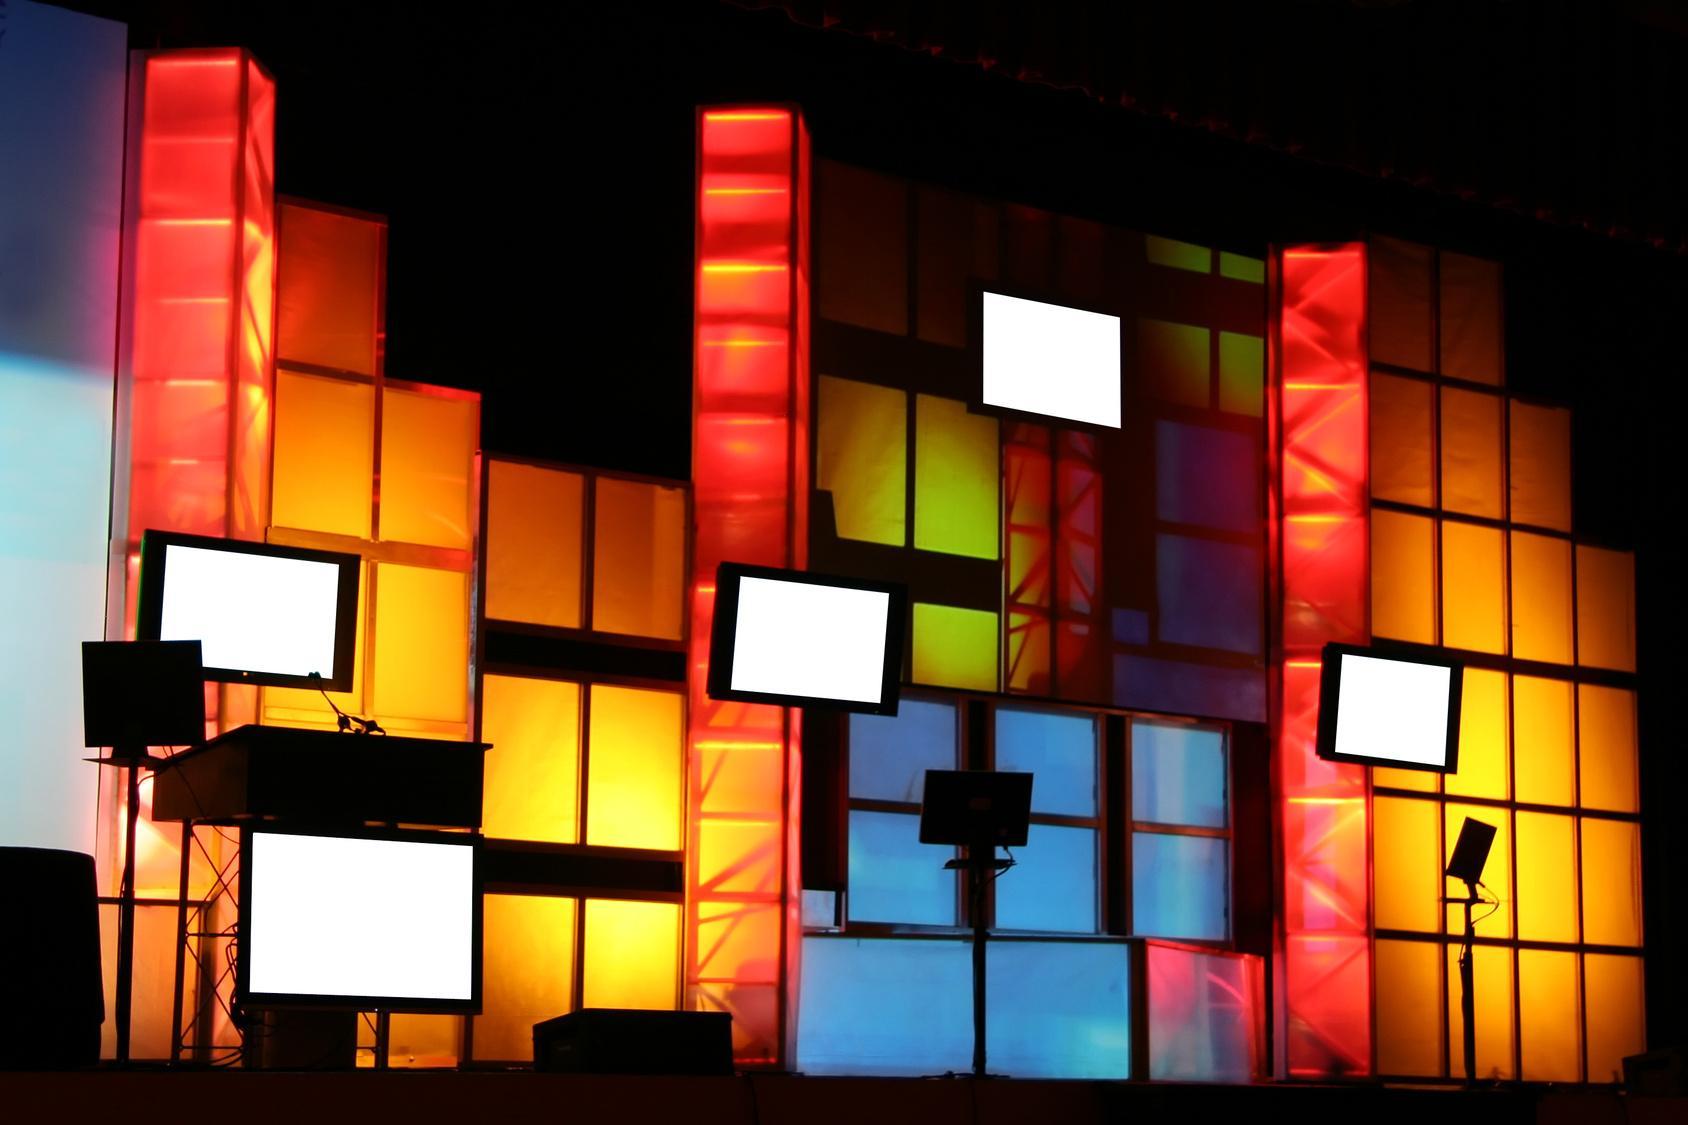 Banery LED - telebimy i ekrany na kazda okazje